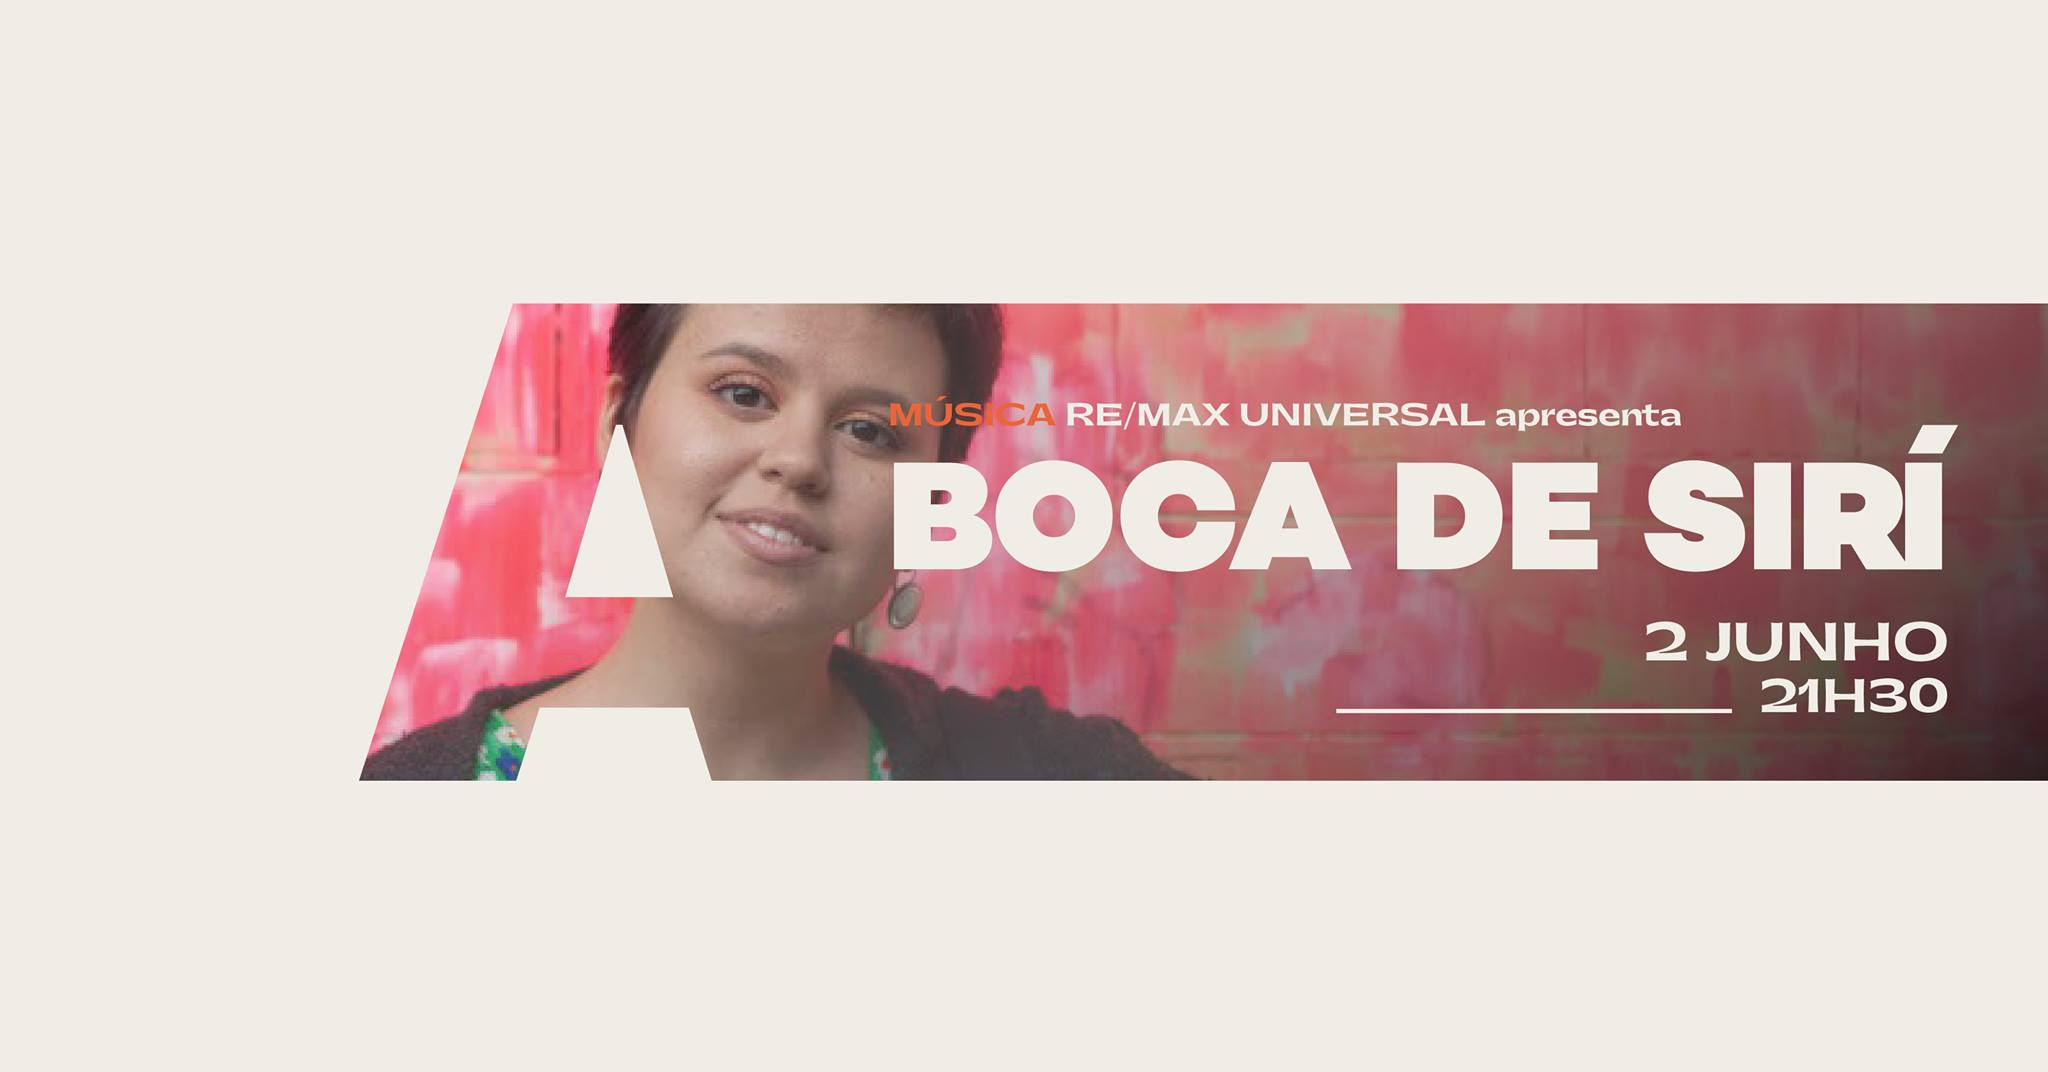 Re/Max Universal apresenta Boca de Sirí @Avenida Café-Concerto